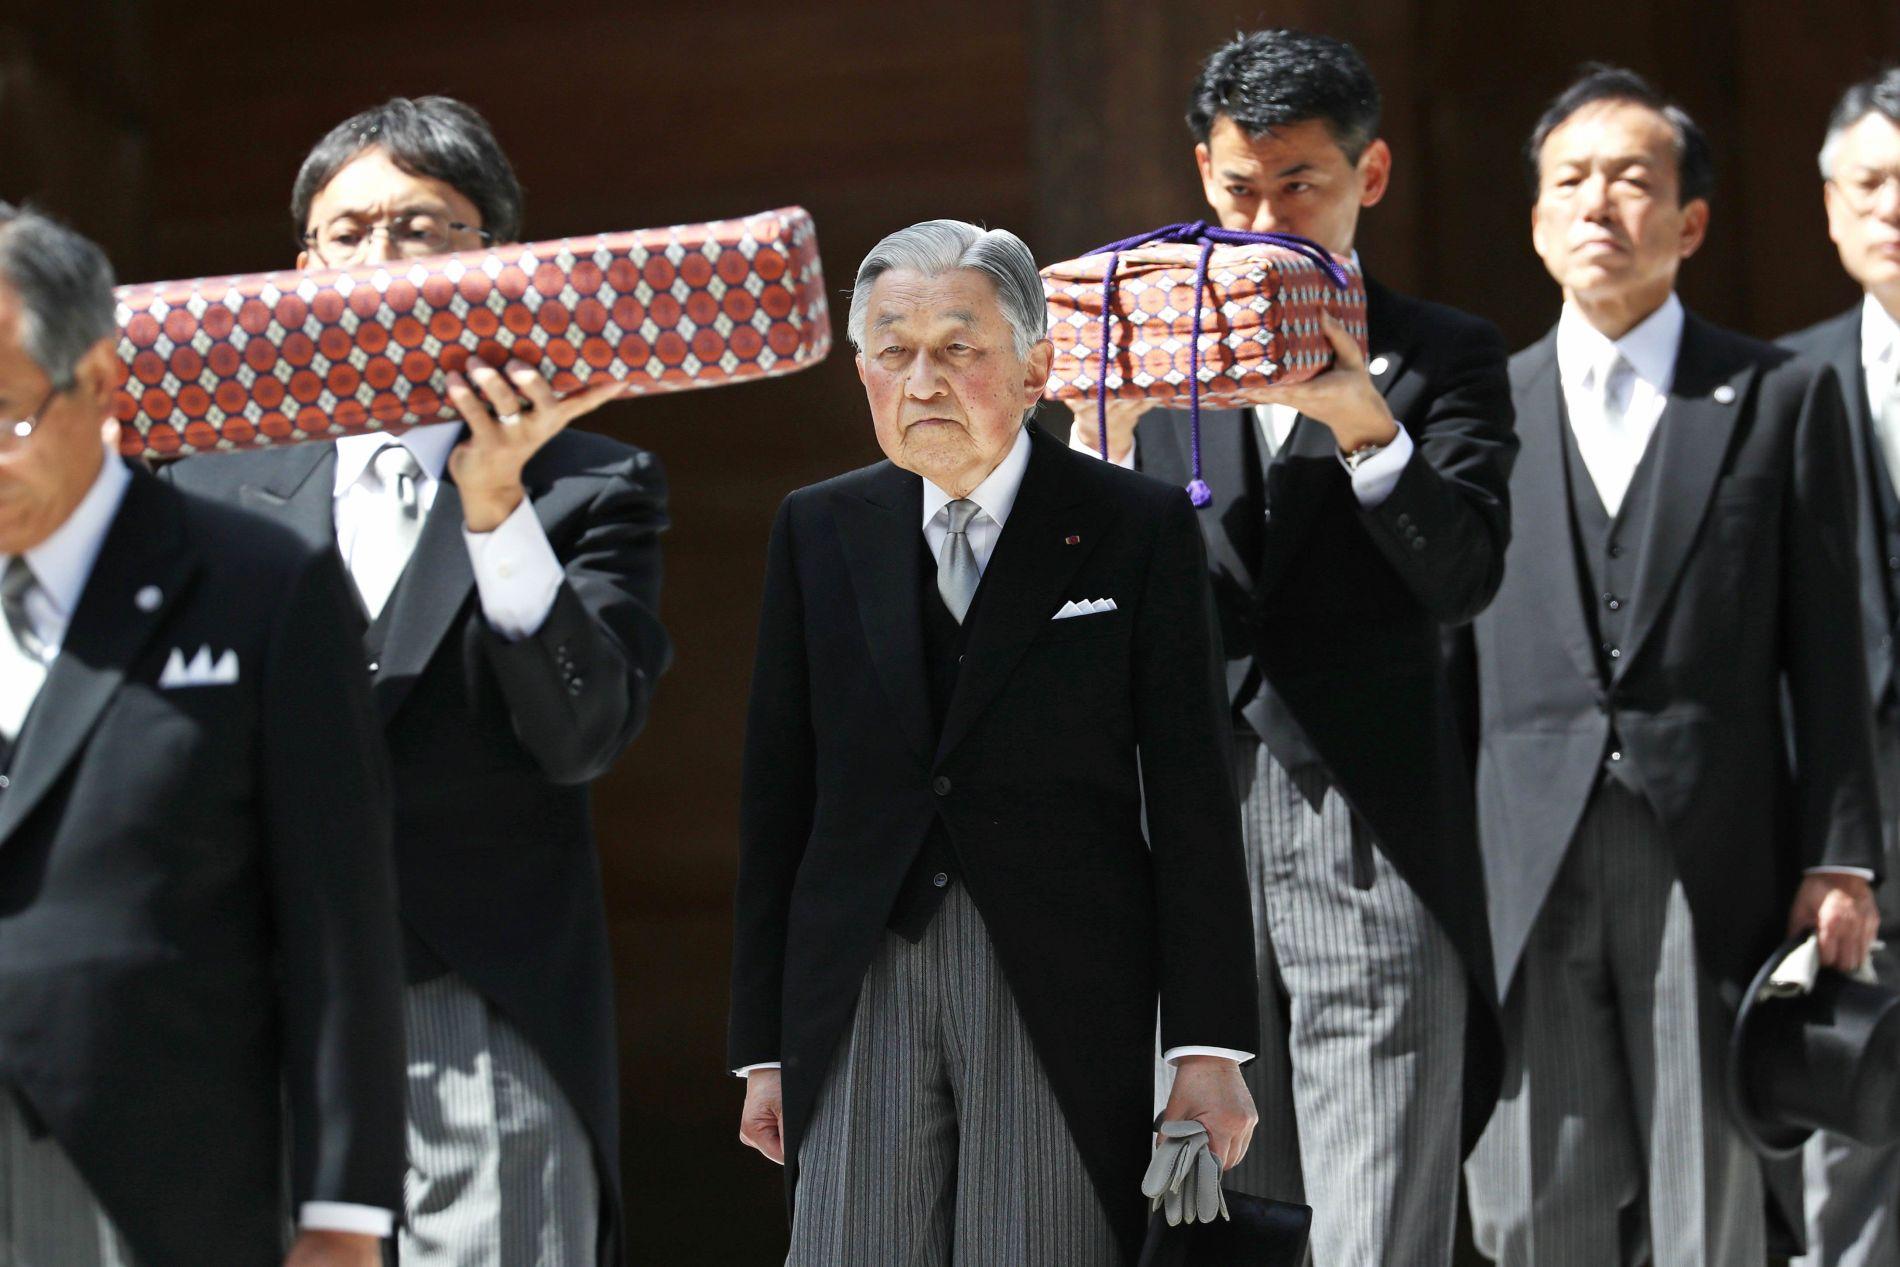 Heisei Emperor Escorting Three Sacred Treasures at end of Heisei Era